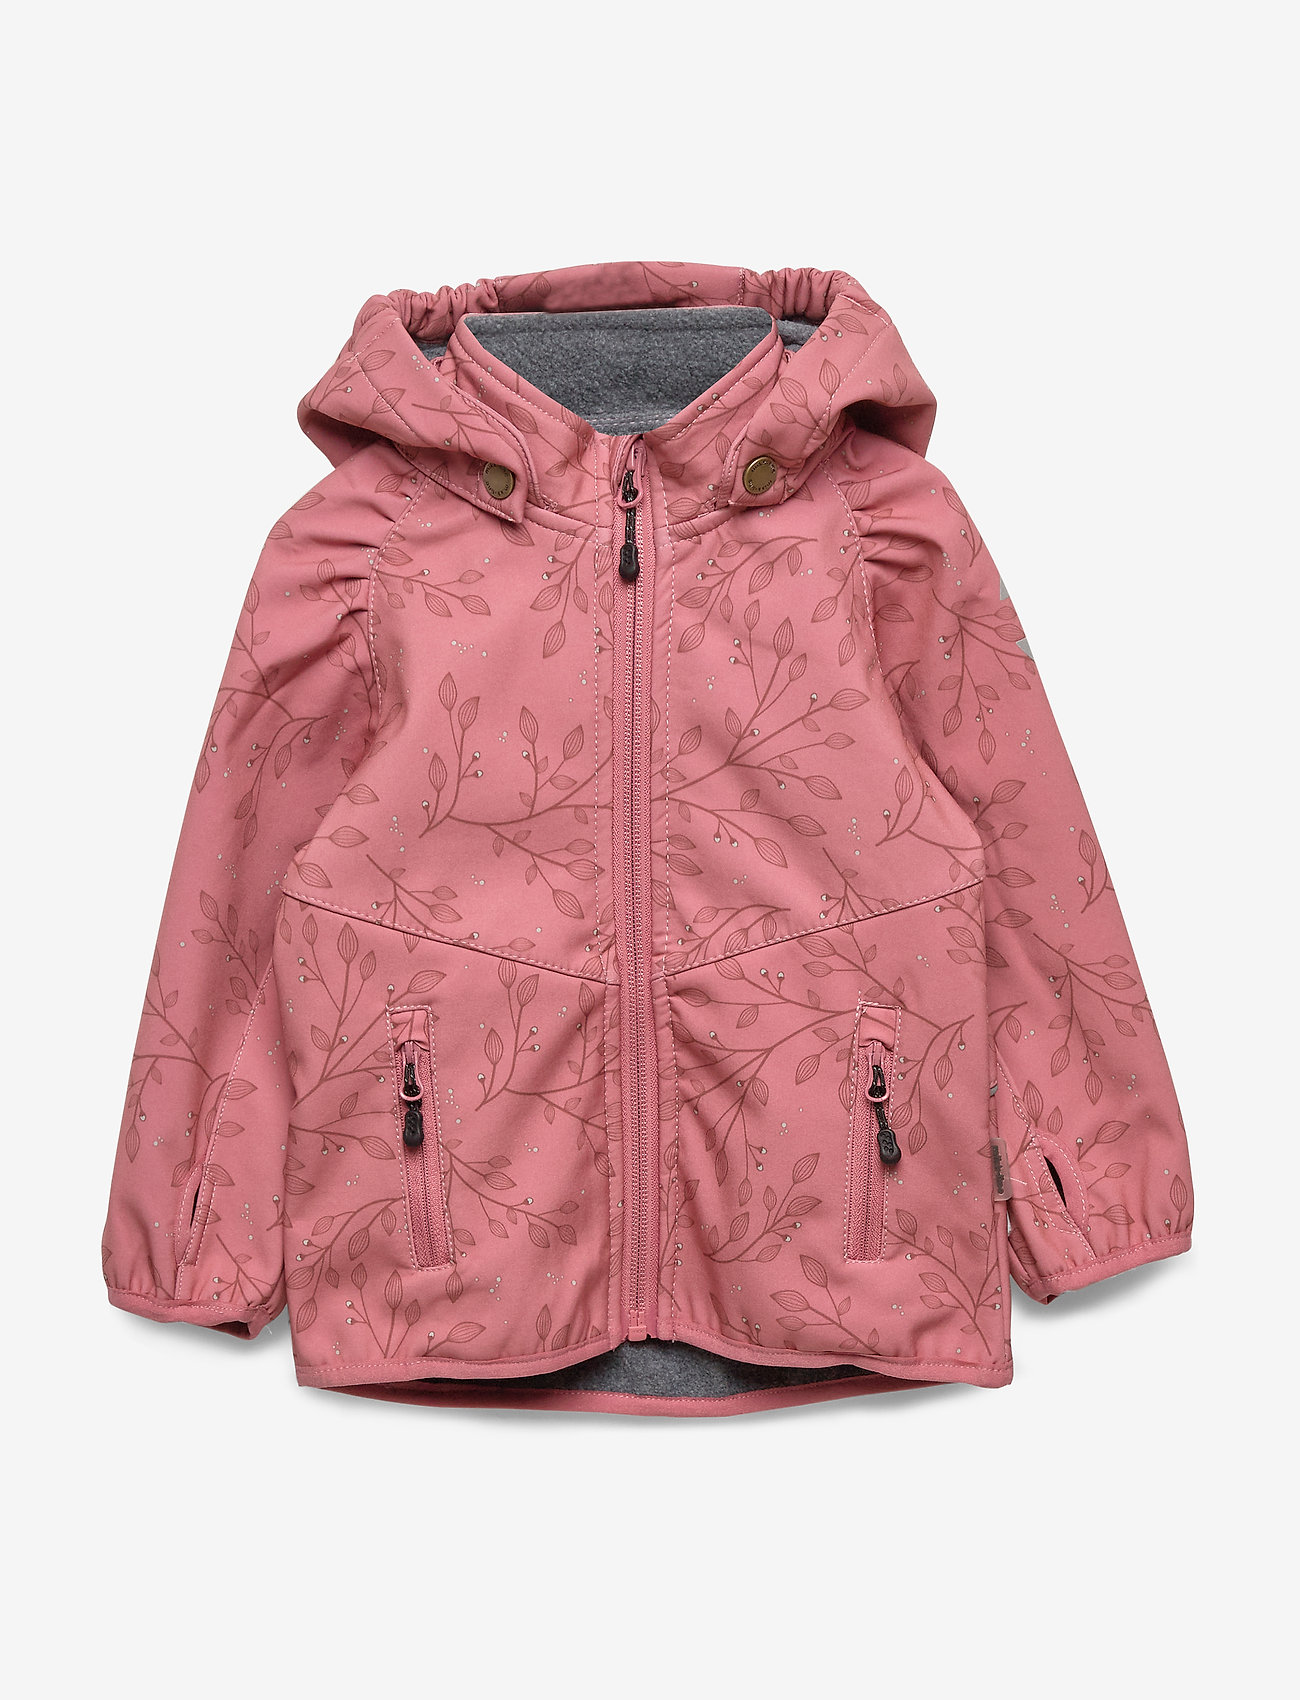 Softshell Girls Jacket W. Print (Heather Rose) (237.65 kr